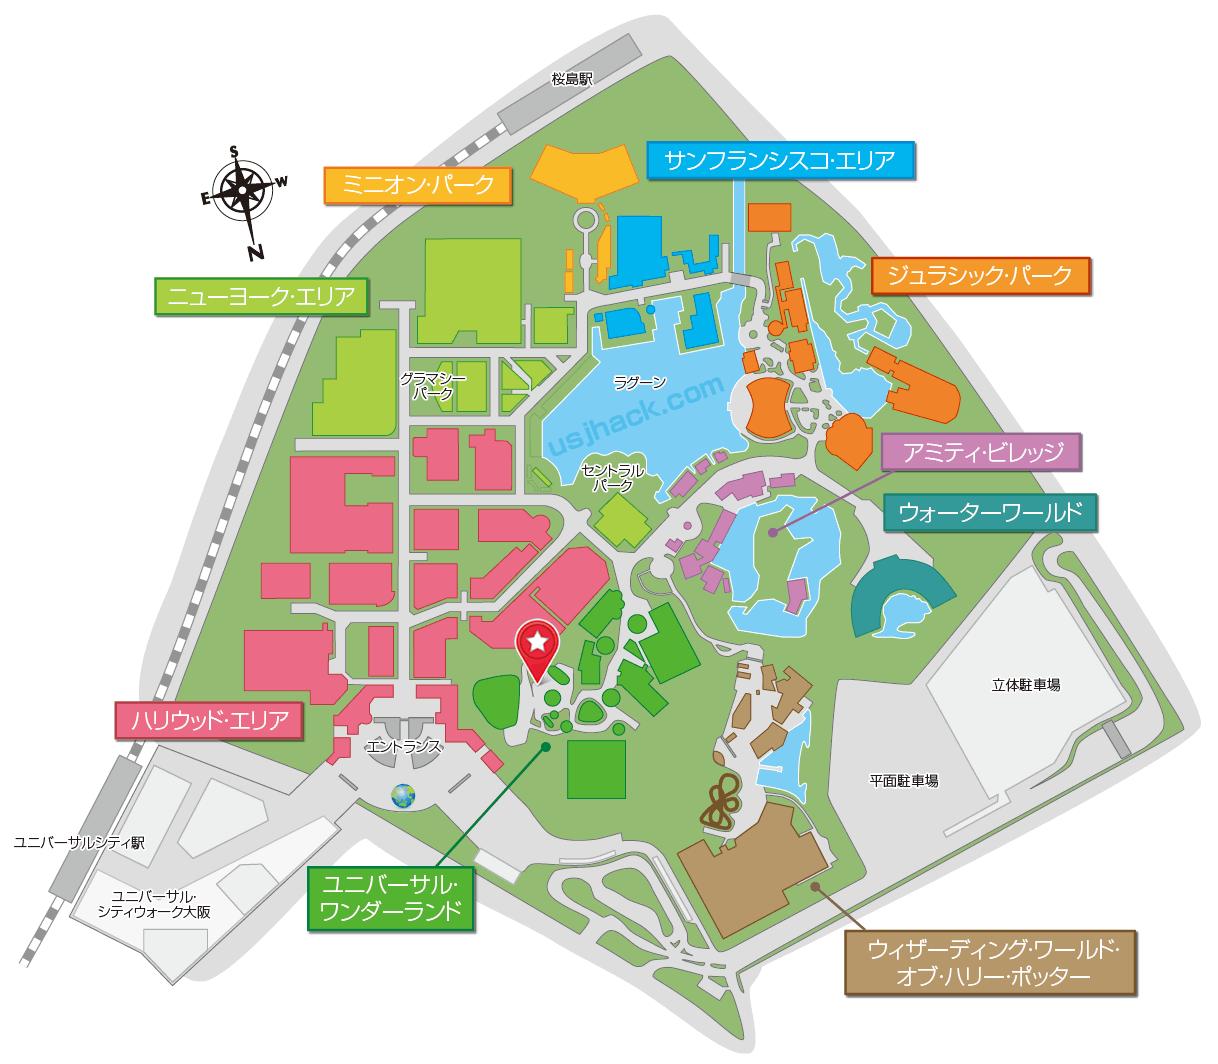 USJウォーターガーデンの地図・場所